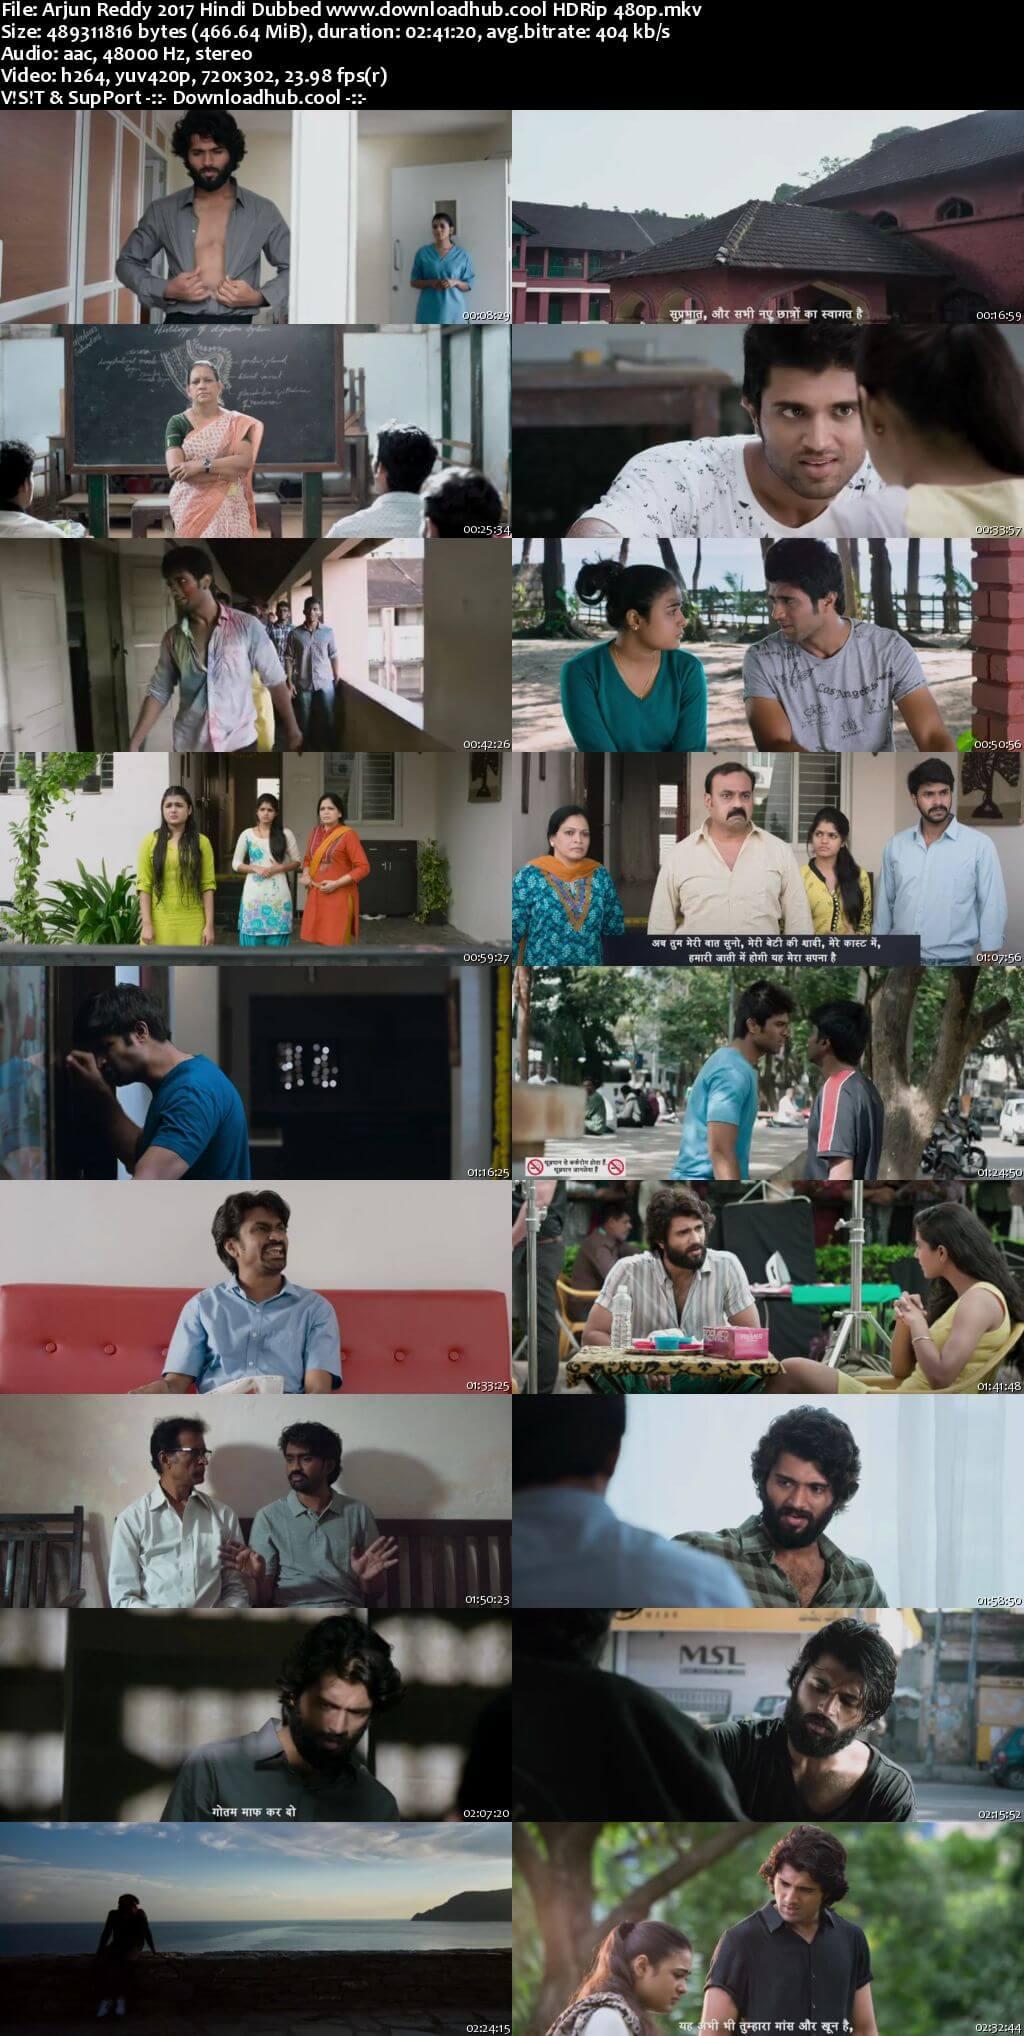 Arjun Reddy 2017 Hindi Dubbed 450MB HDRip 480p